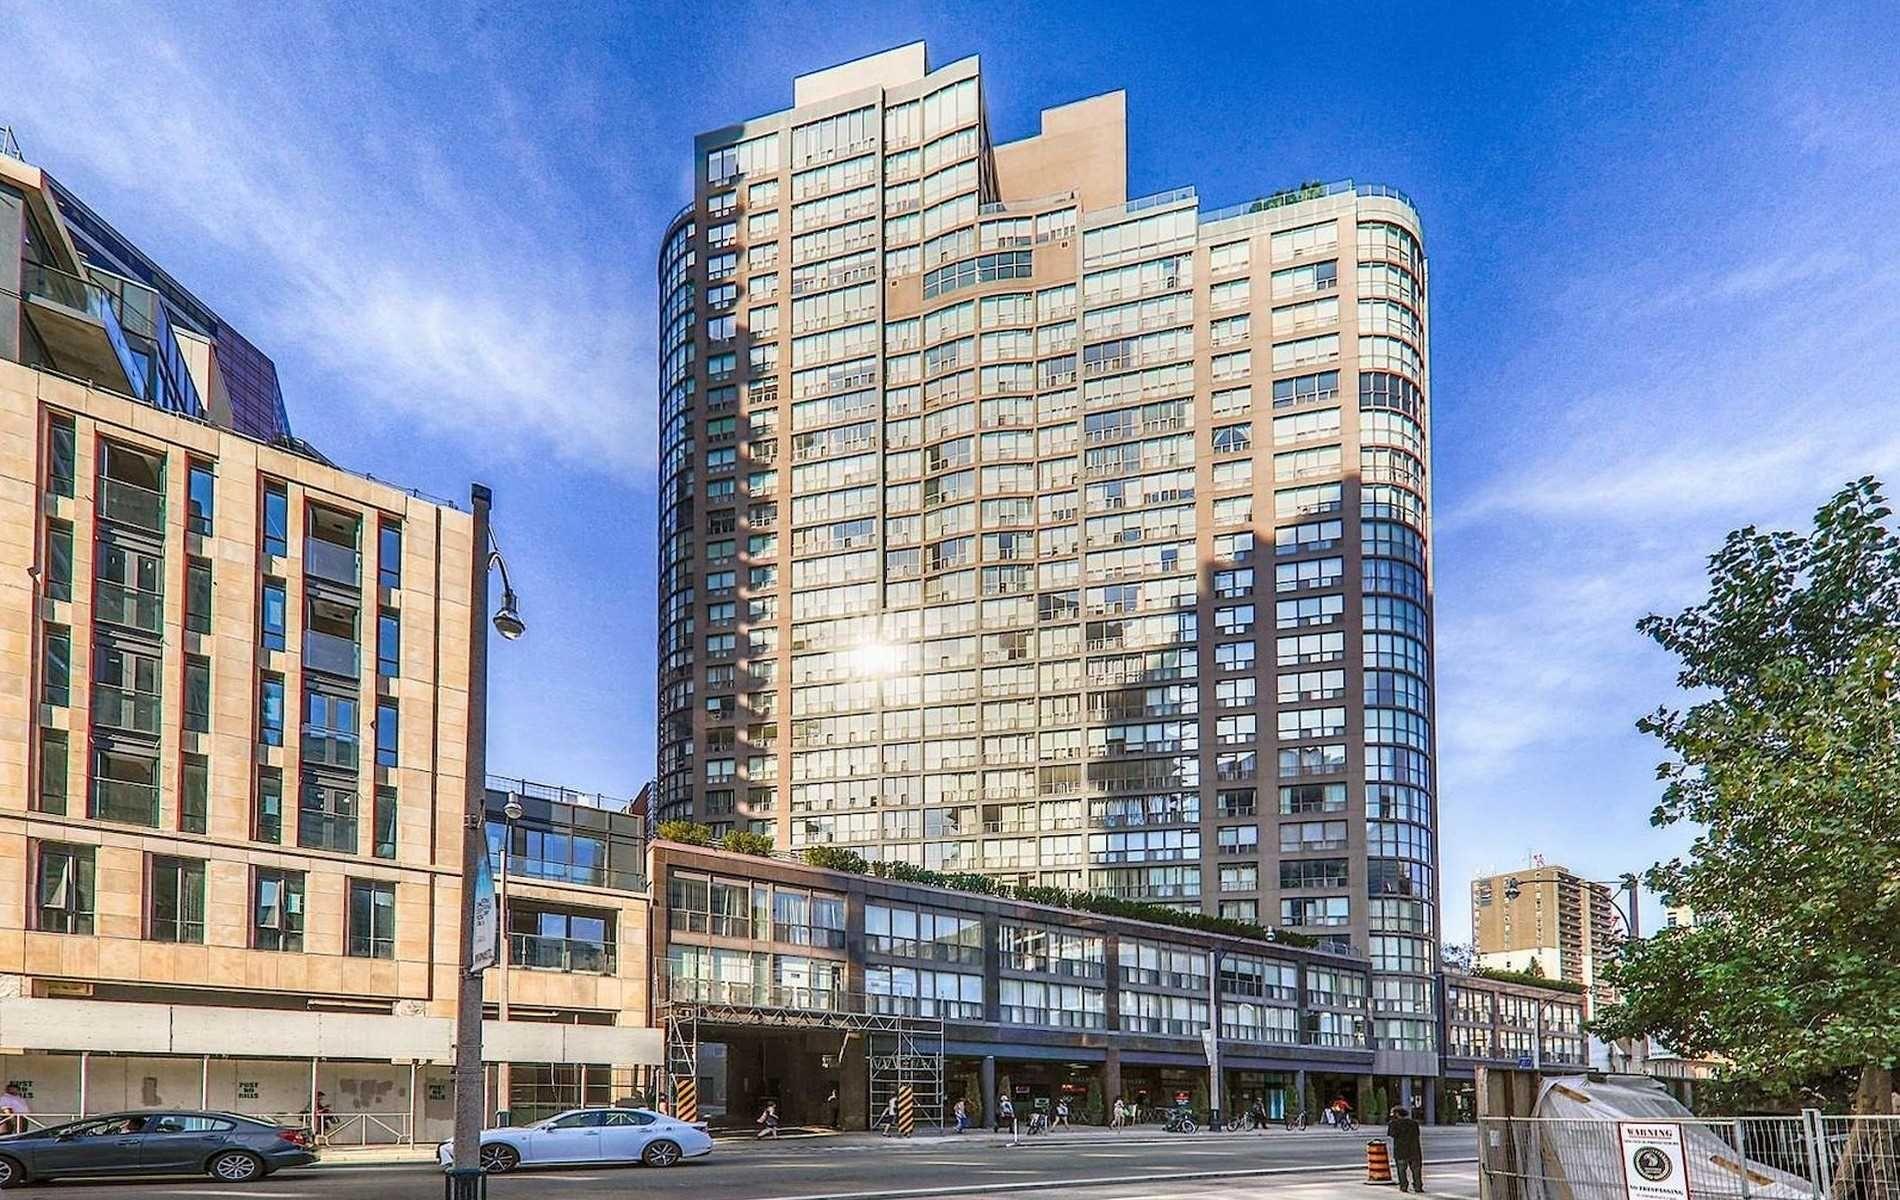 Main Photo: 606 24 W Wellesley Street in Toronto: Bay Street Corridor Condo for lease (Toronto C01)  : MLS®# C5329466